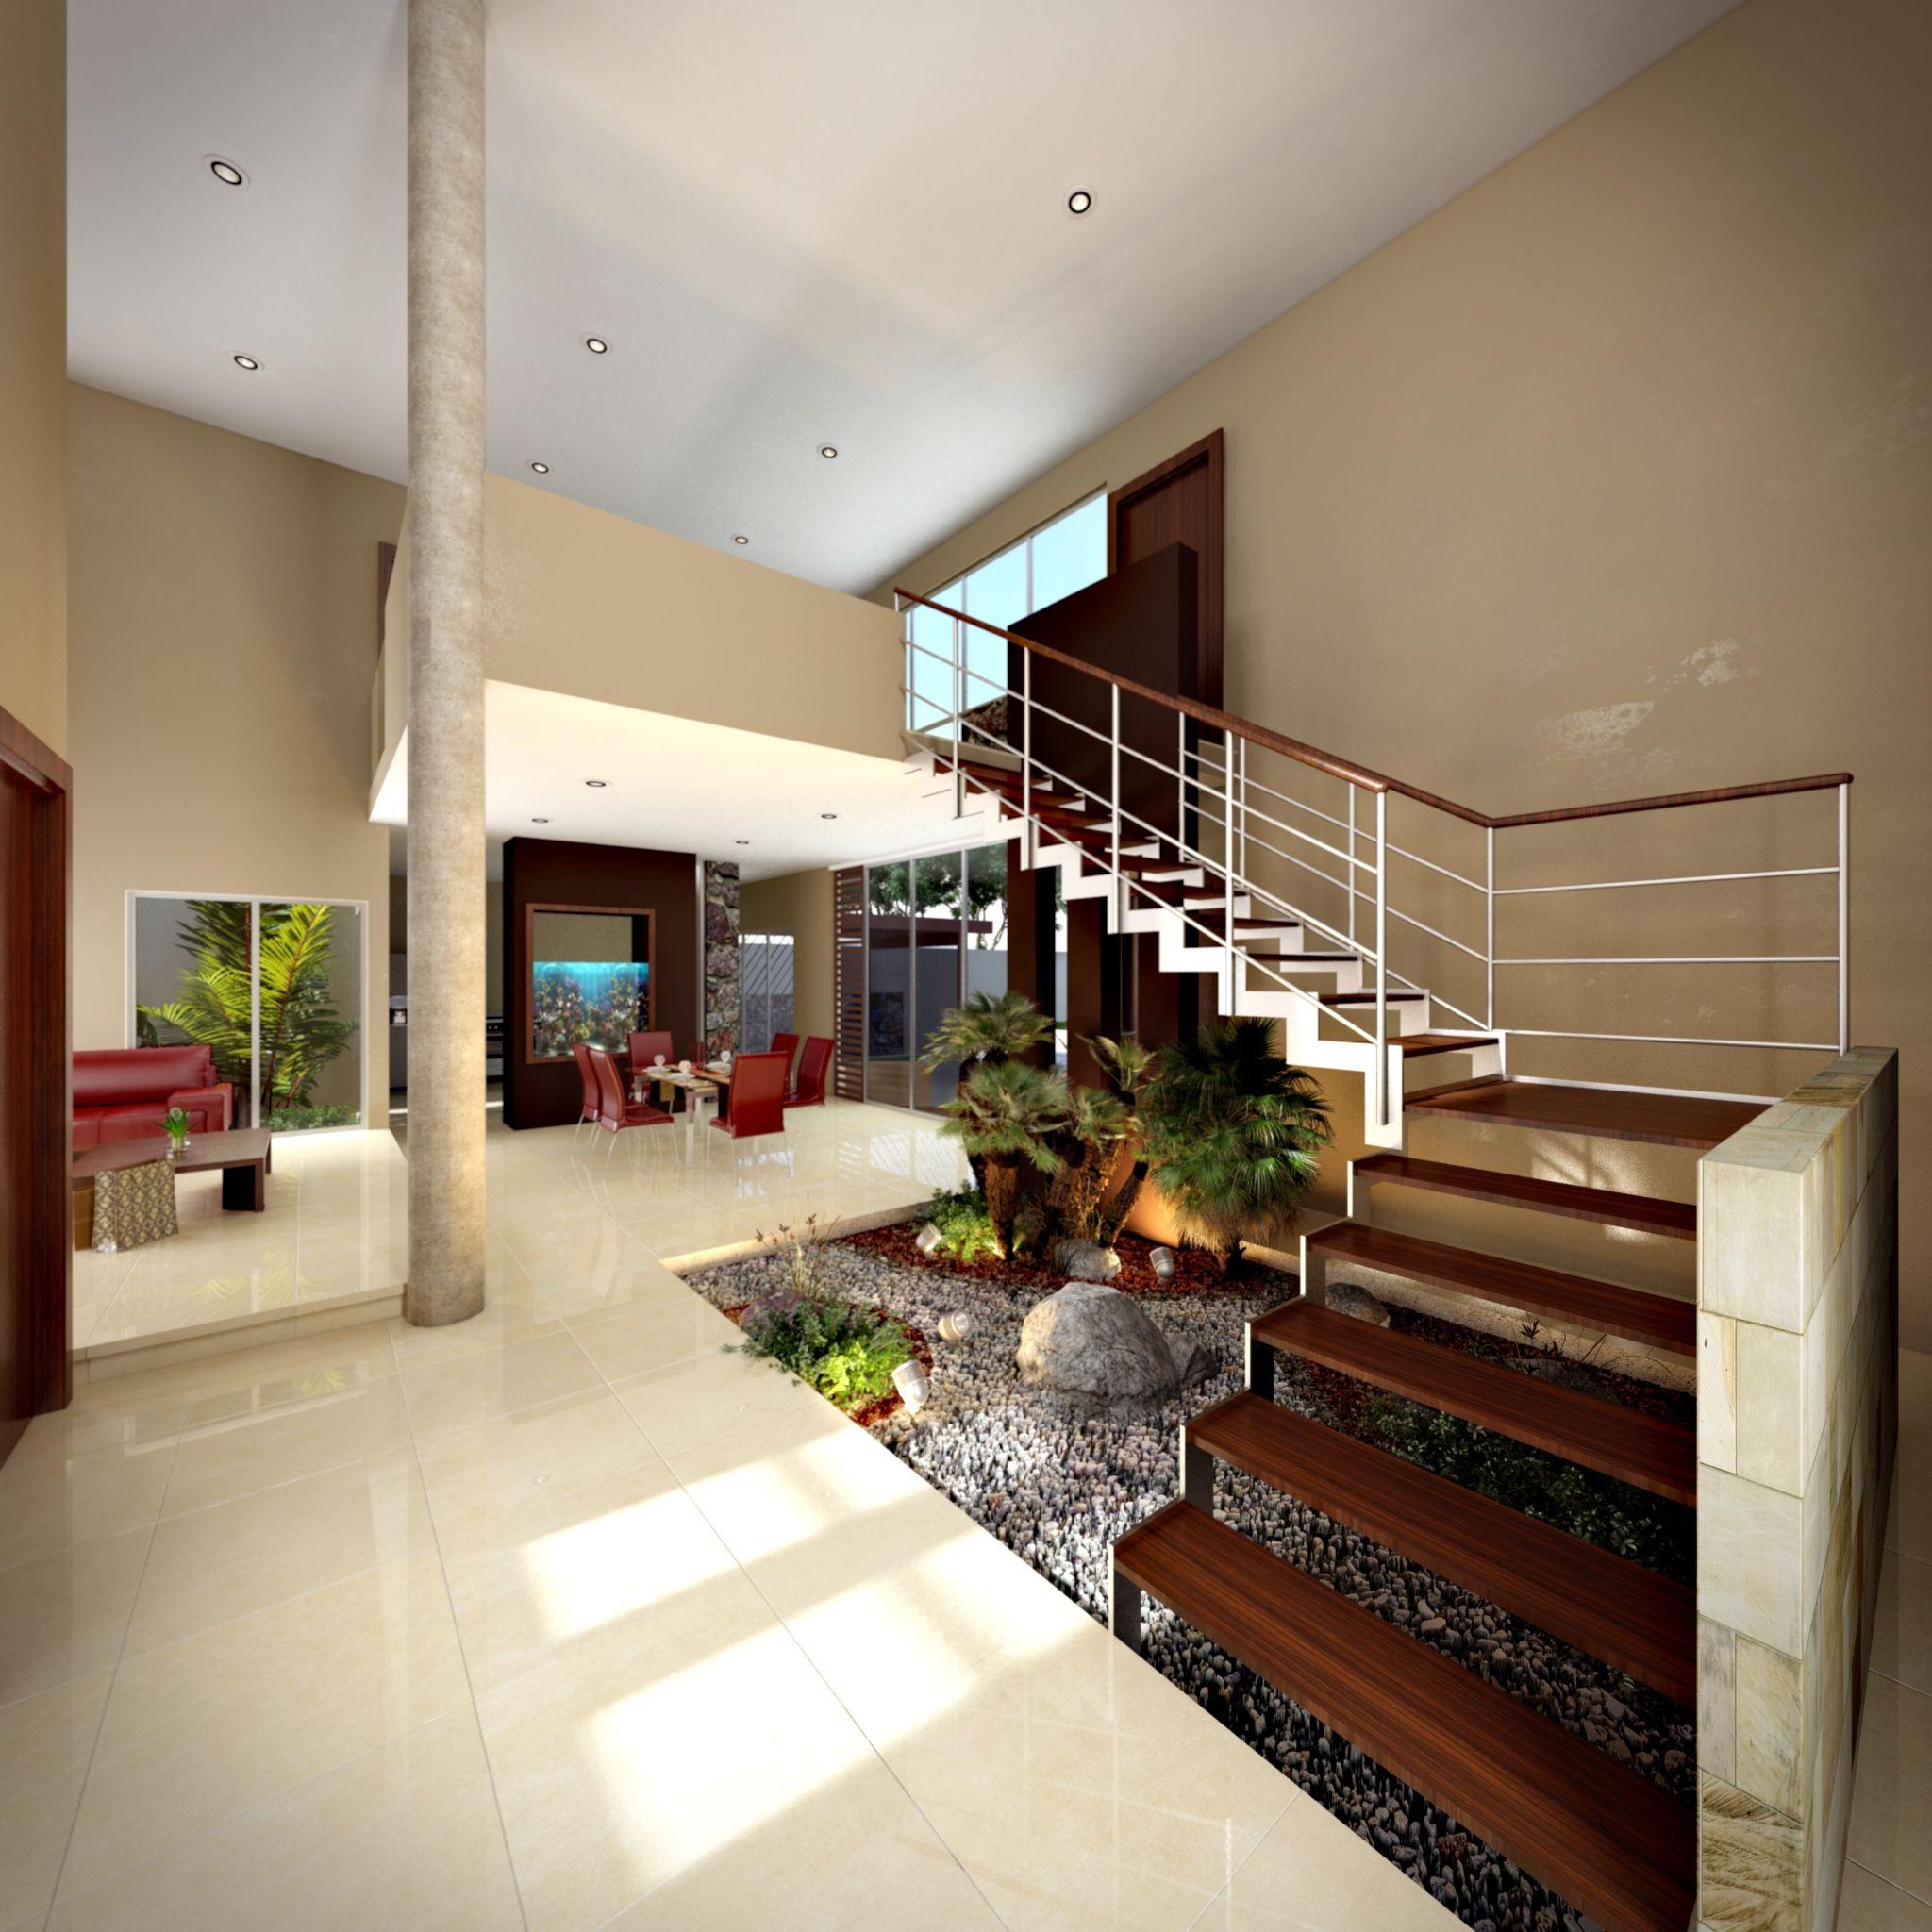 V stibulo a doble altura escaleras con pelda os de madera for Escalera de bloque de jardin